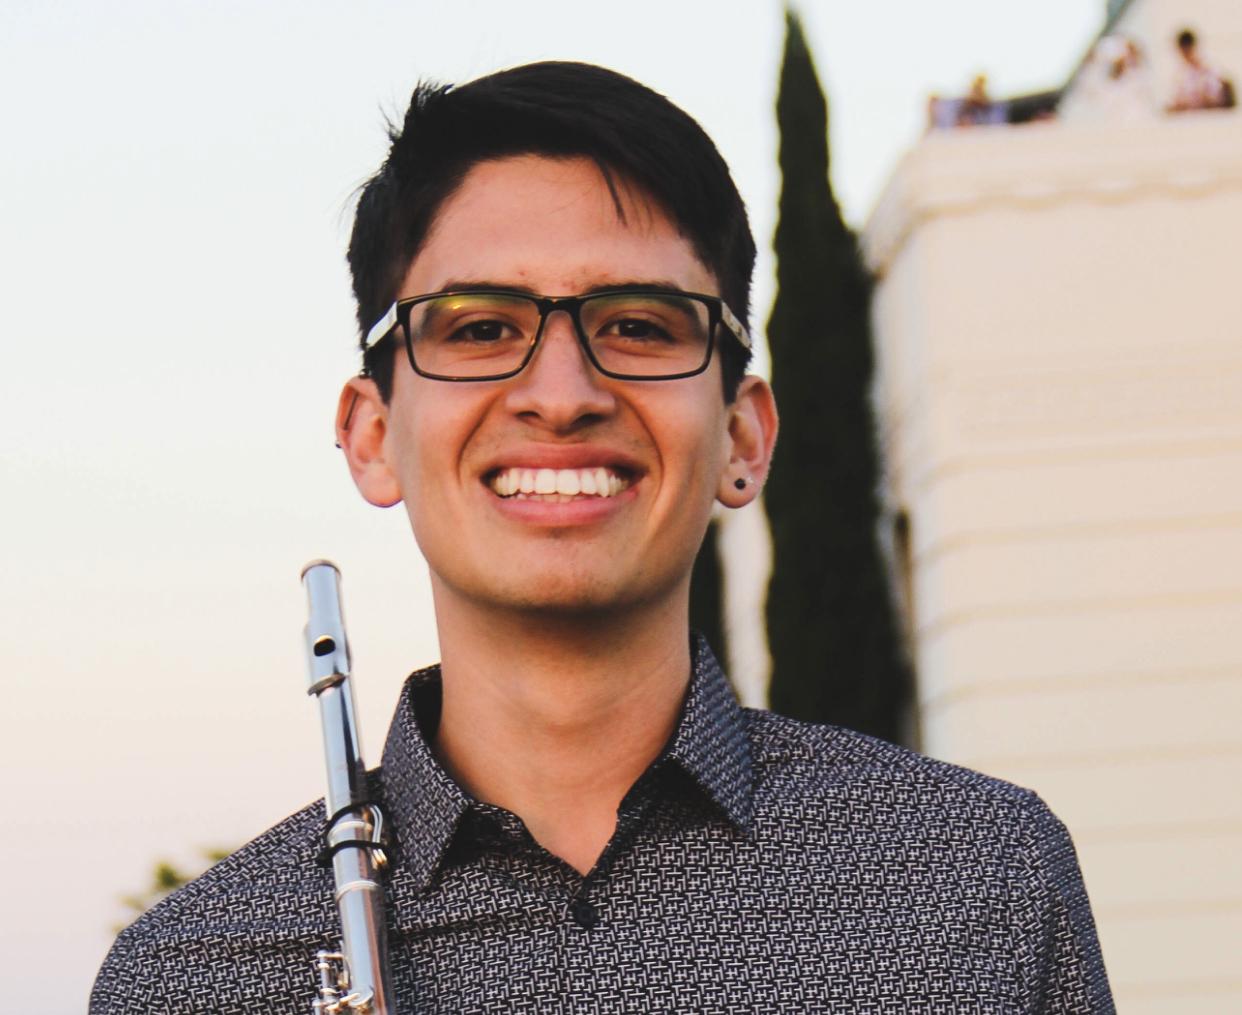 Alumni Story: Devan Jaquez and Chasing Opportunities